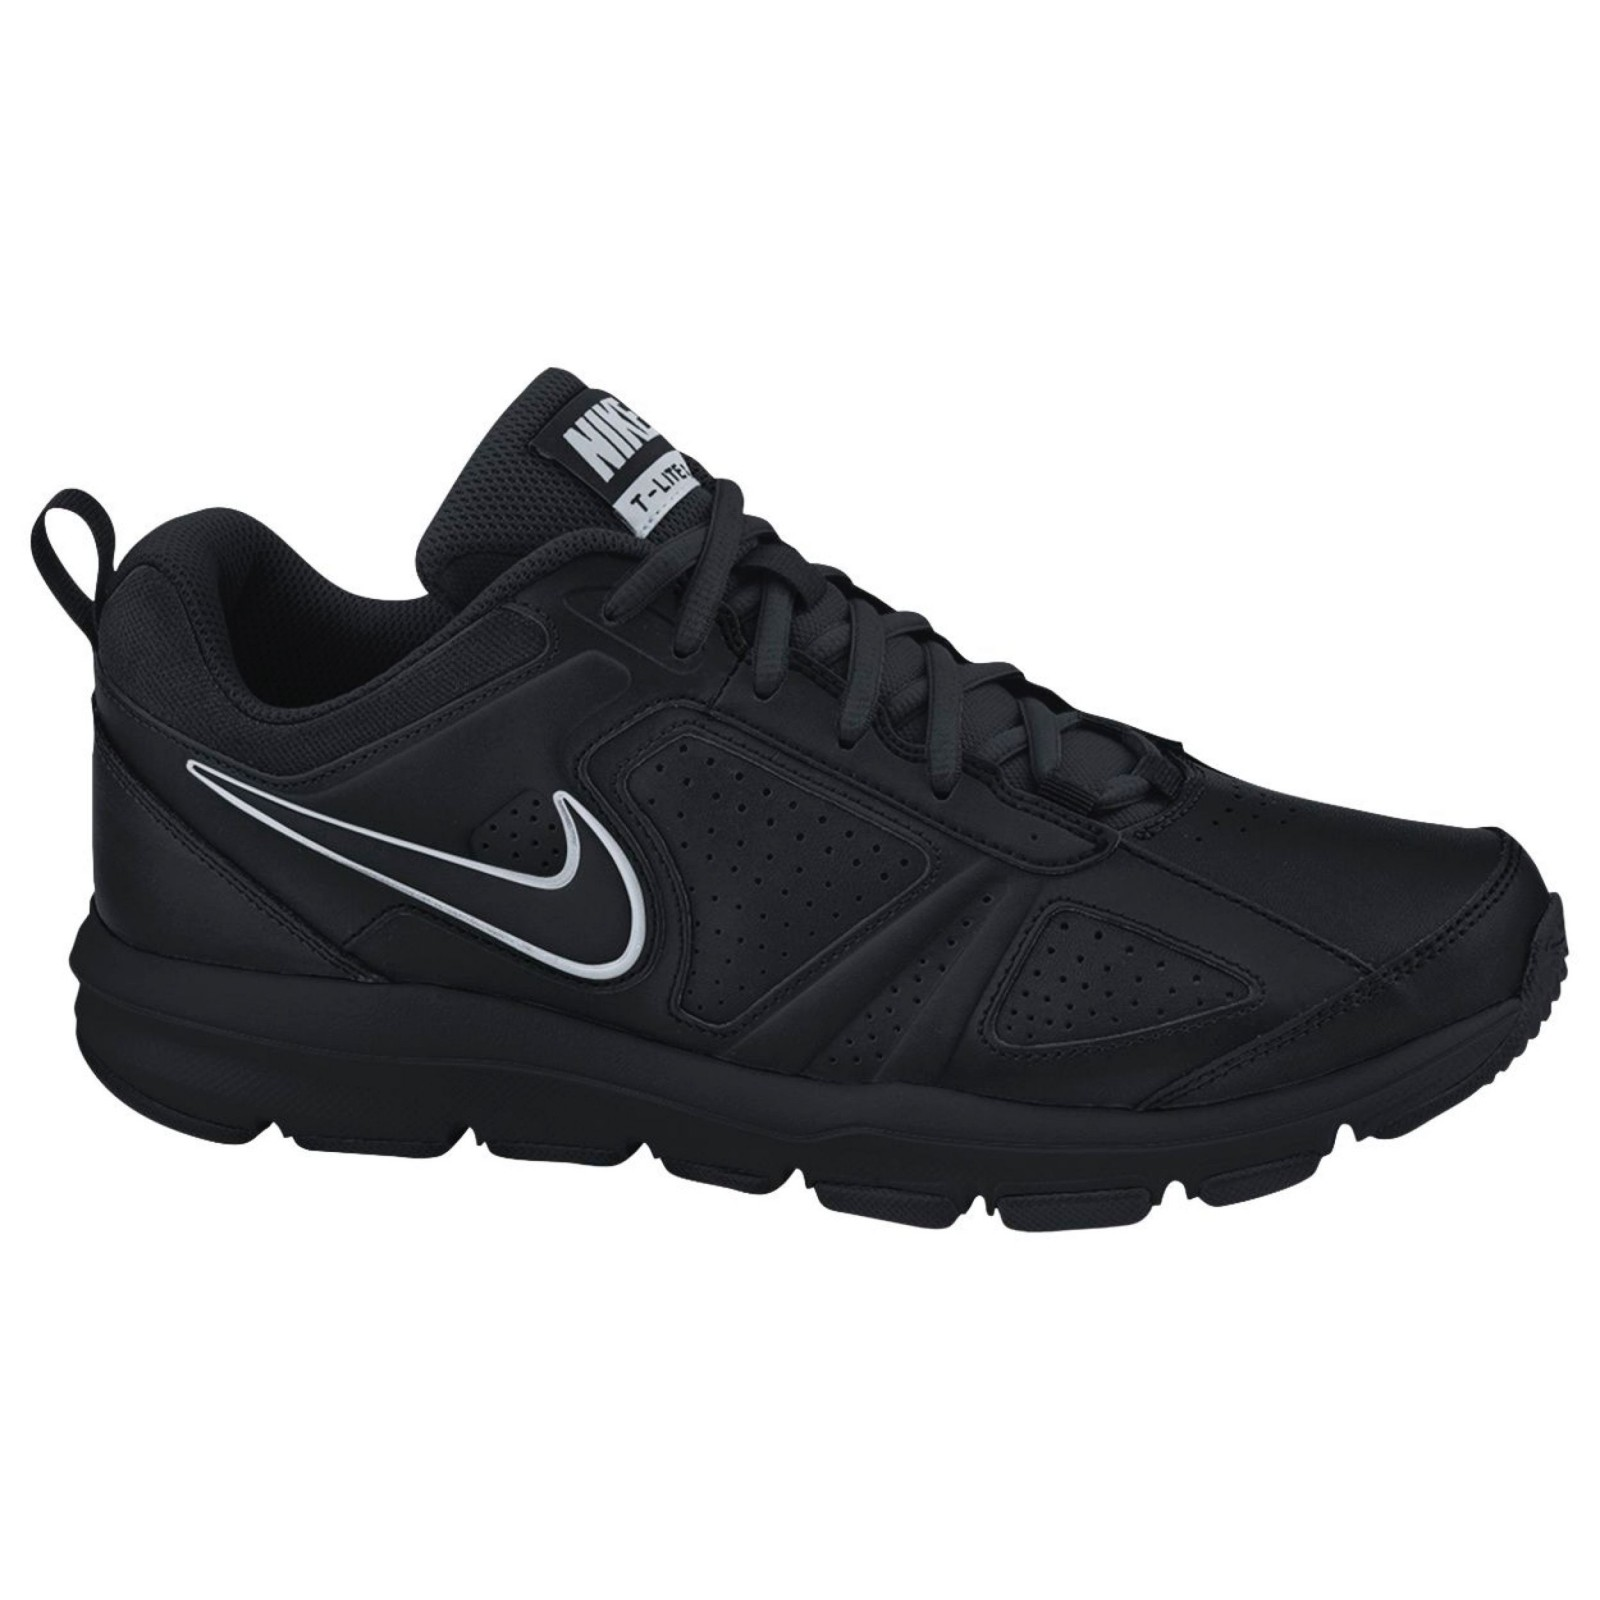 ad60b7868b9 Pánská fitness obuv Nike T-LITE XI